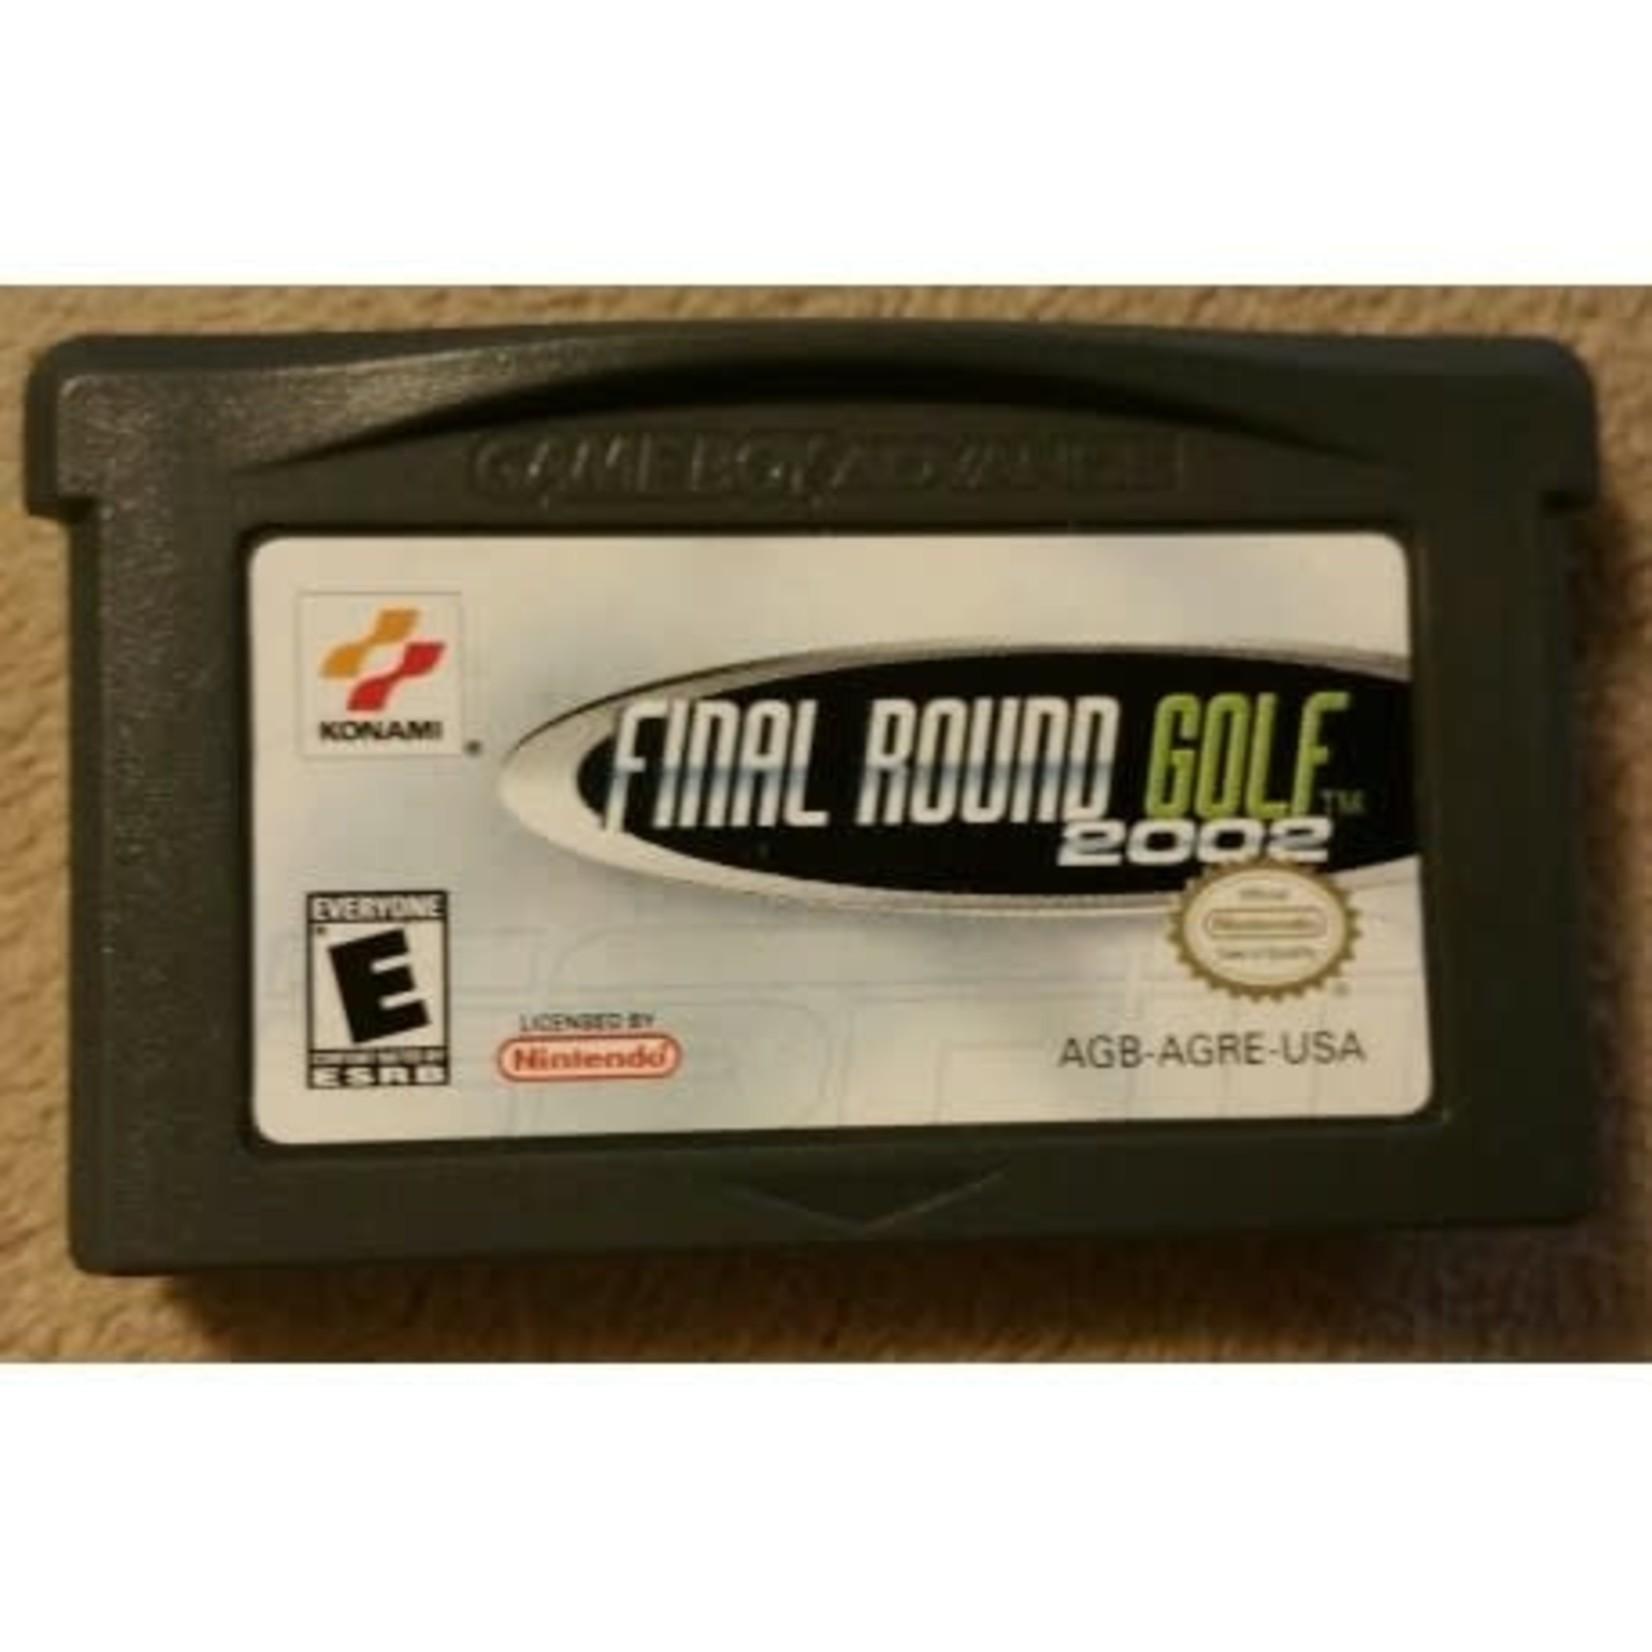 GBAU-ESPN Final Round Golf 2002